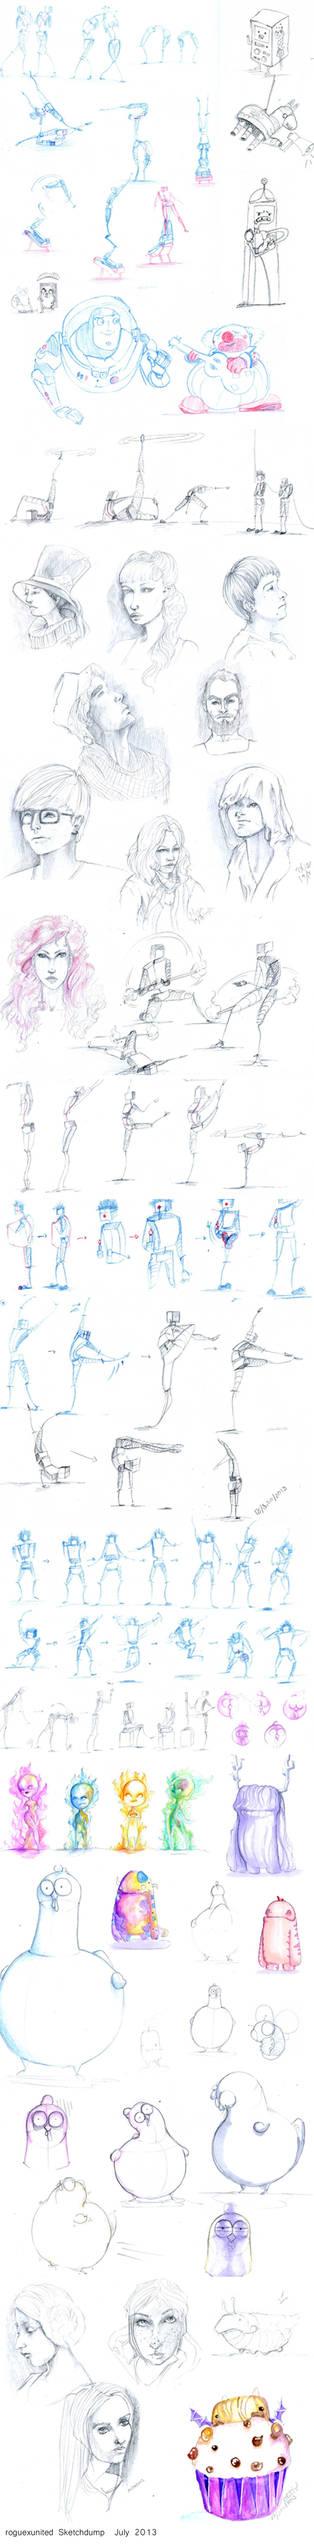 Sketchdump July 2013